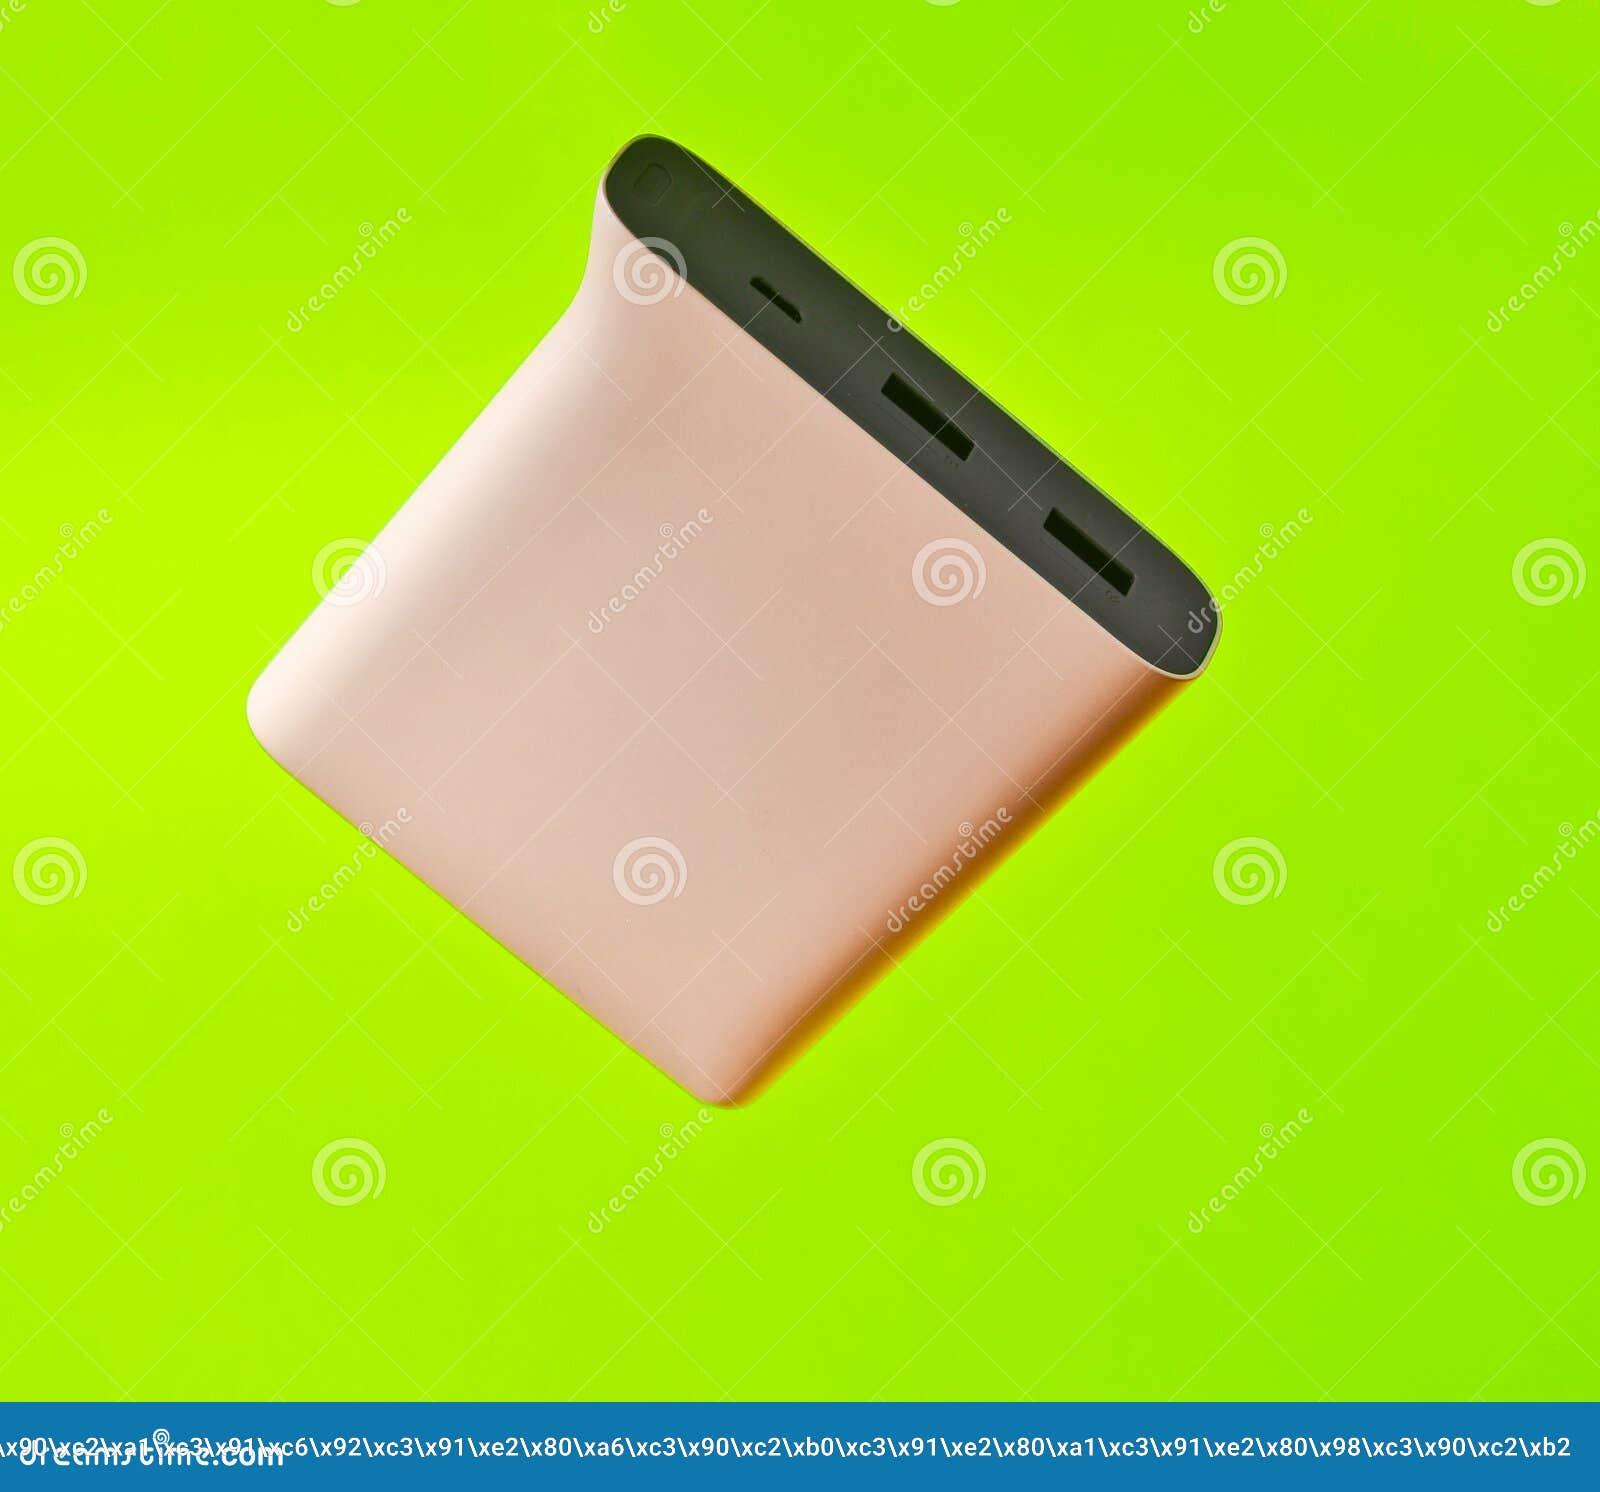 Power Bank Pale Pink Color On A Green Background. External Batt ...